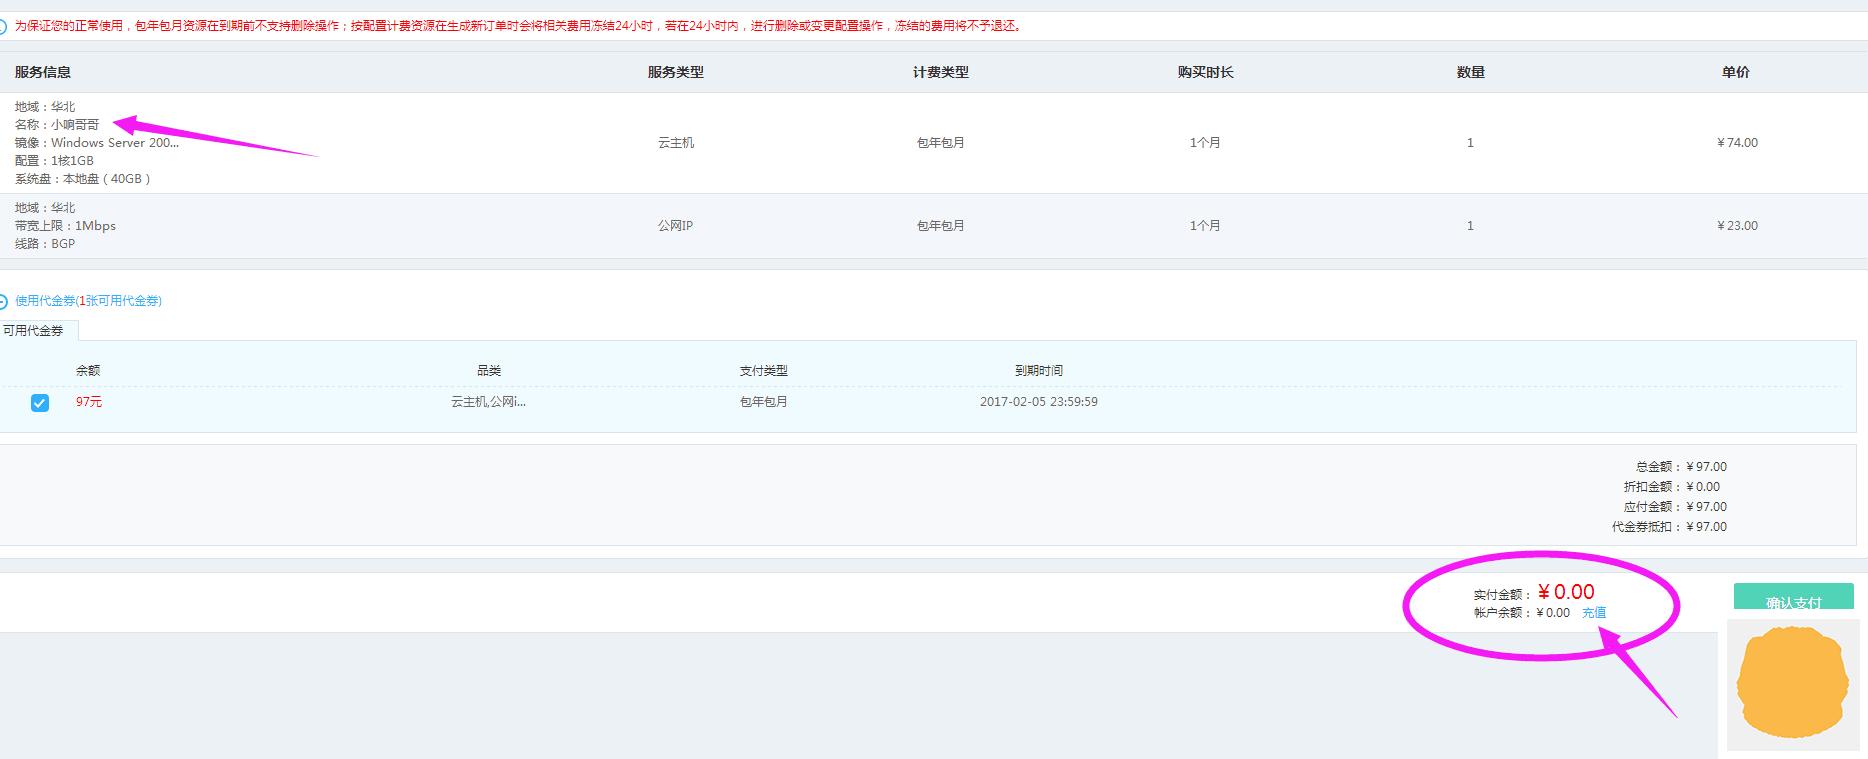 d8a21480945728 - 京东云服务器免费体验一个月